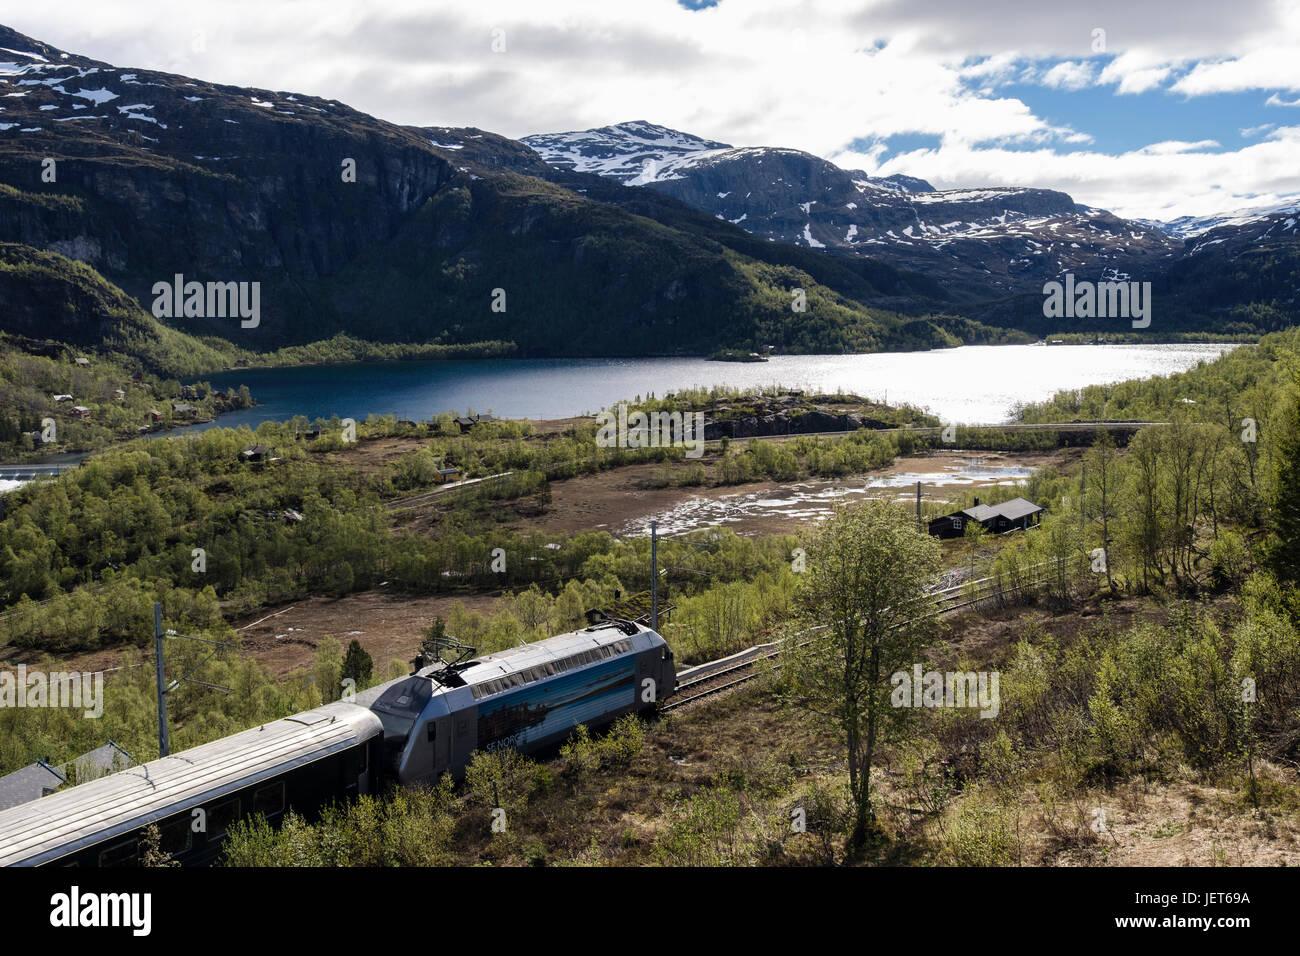 Flam Railway train journey through lake and mountain landscape in summer. Vatnahelsen, Aurland, Norway, Scandinavia, - Stock Image